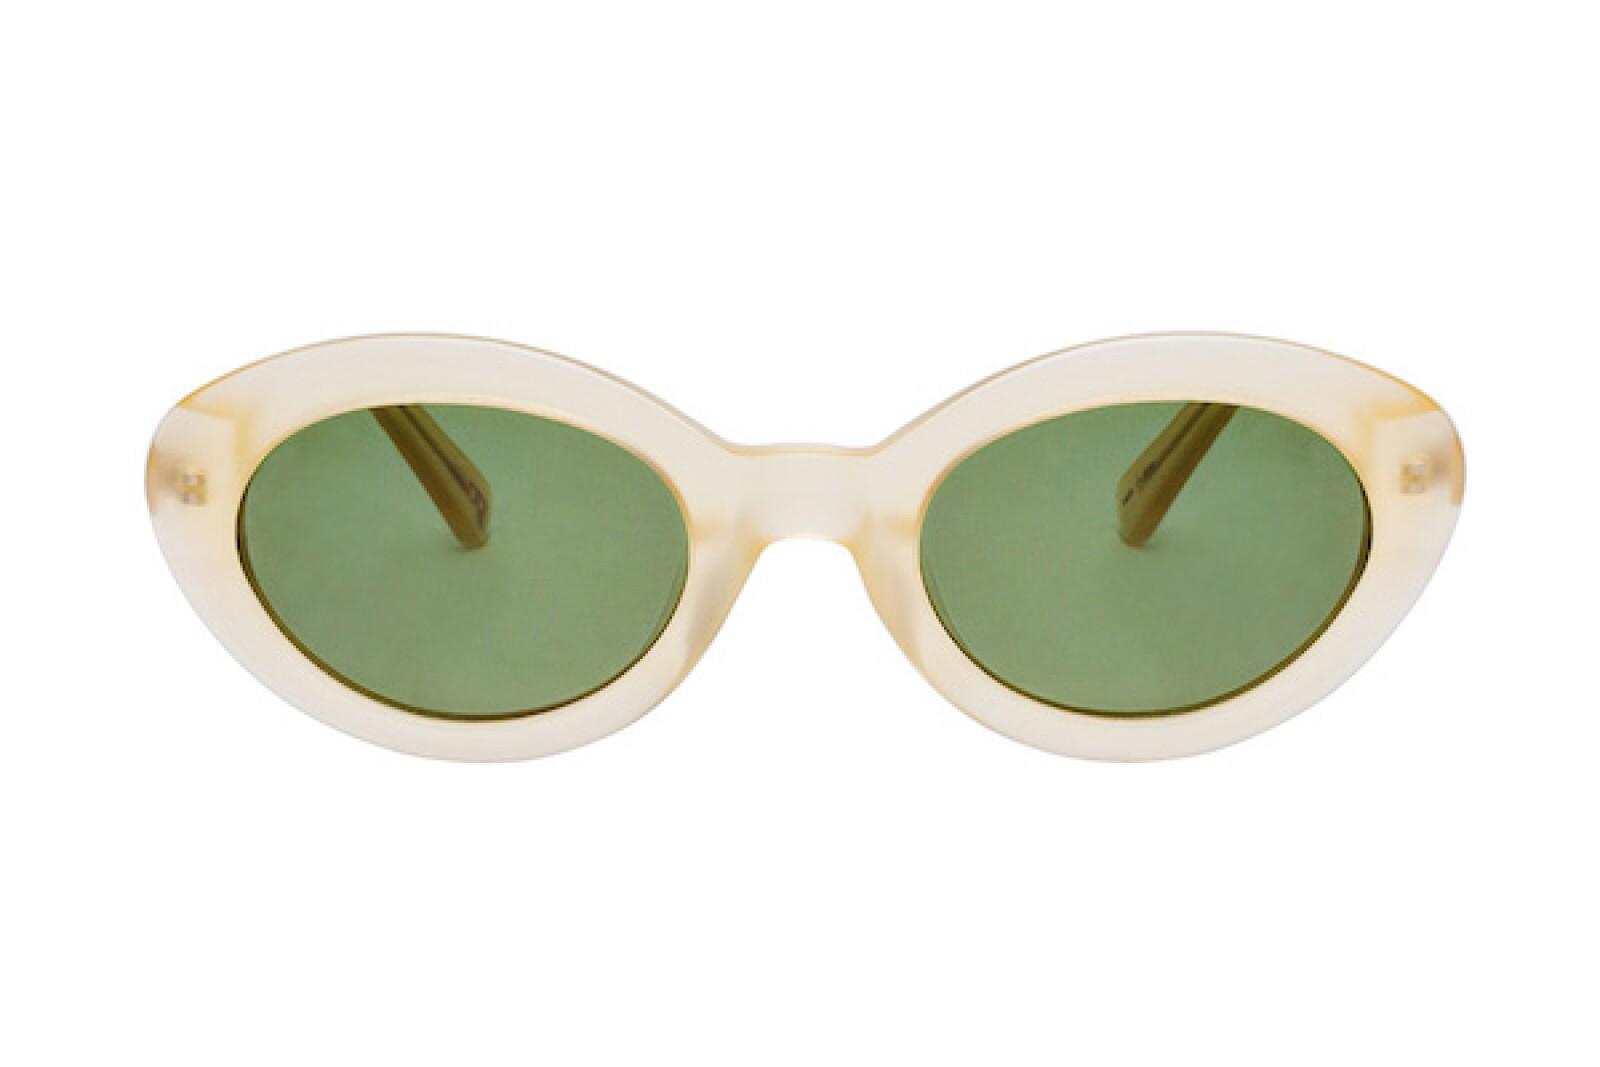 Absurda Sunglasses_ murillo